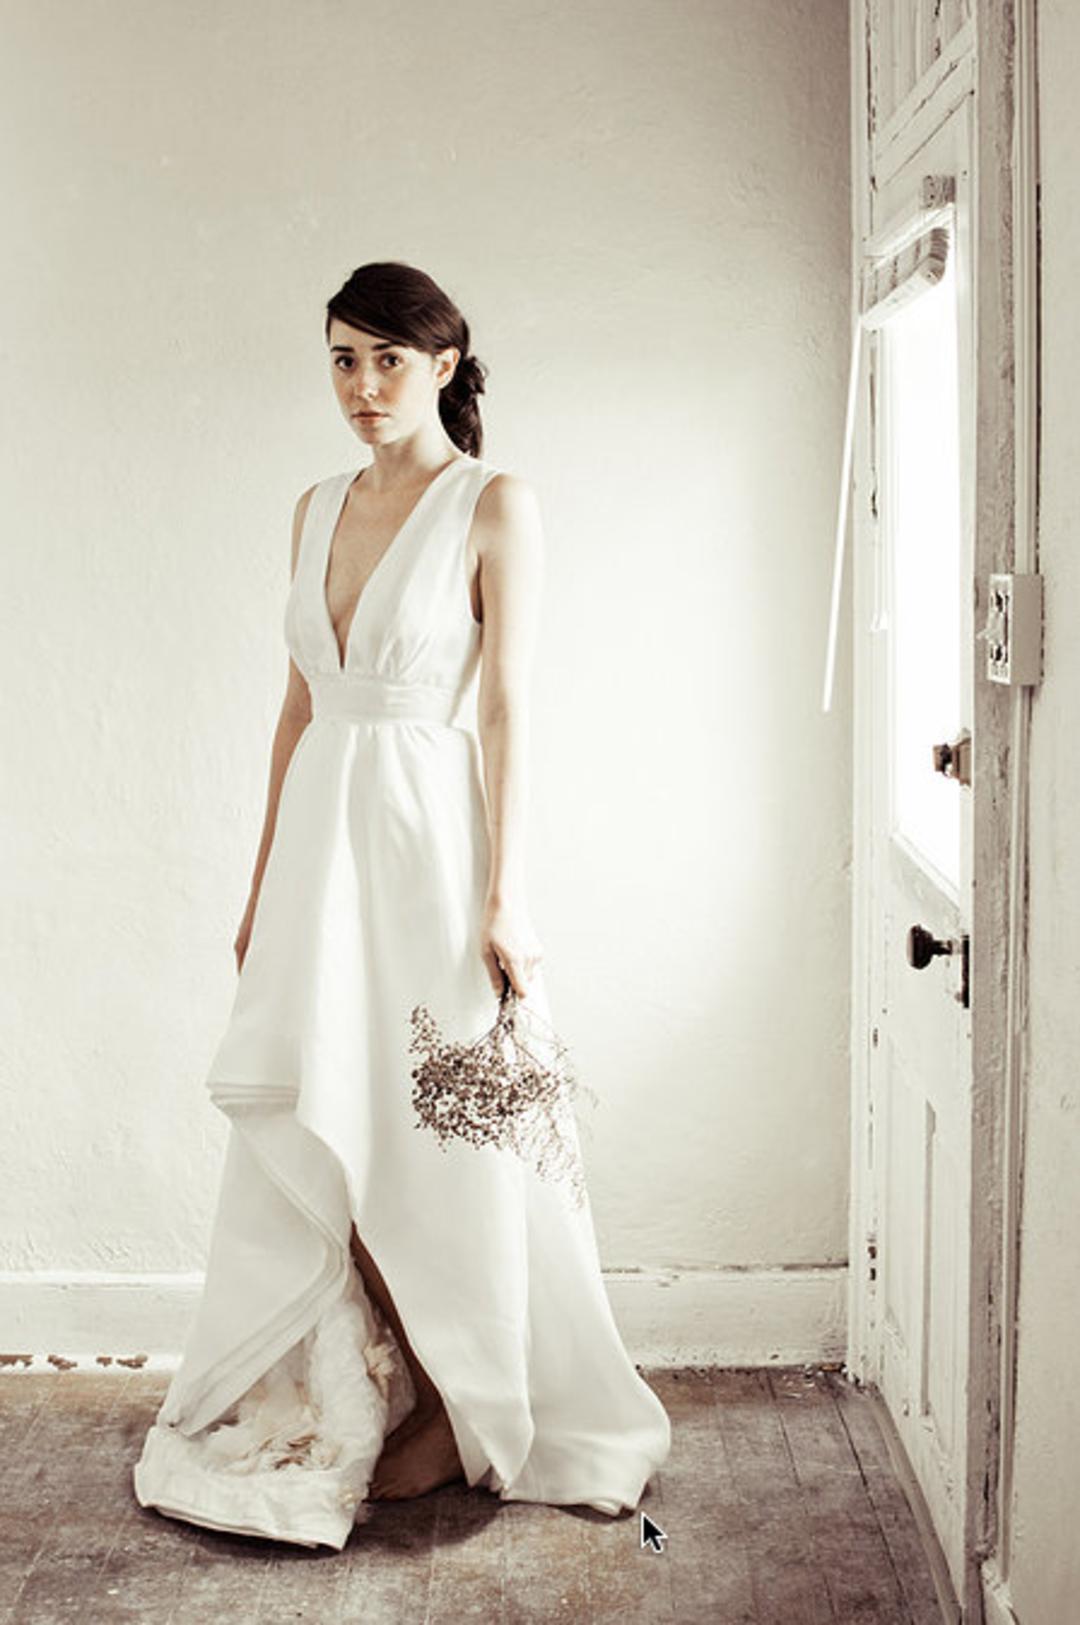 Wedding Gown Trunk Shows 60 Cool Image via Faith Thornburg